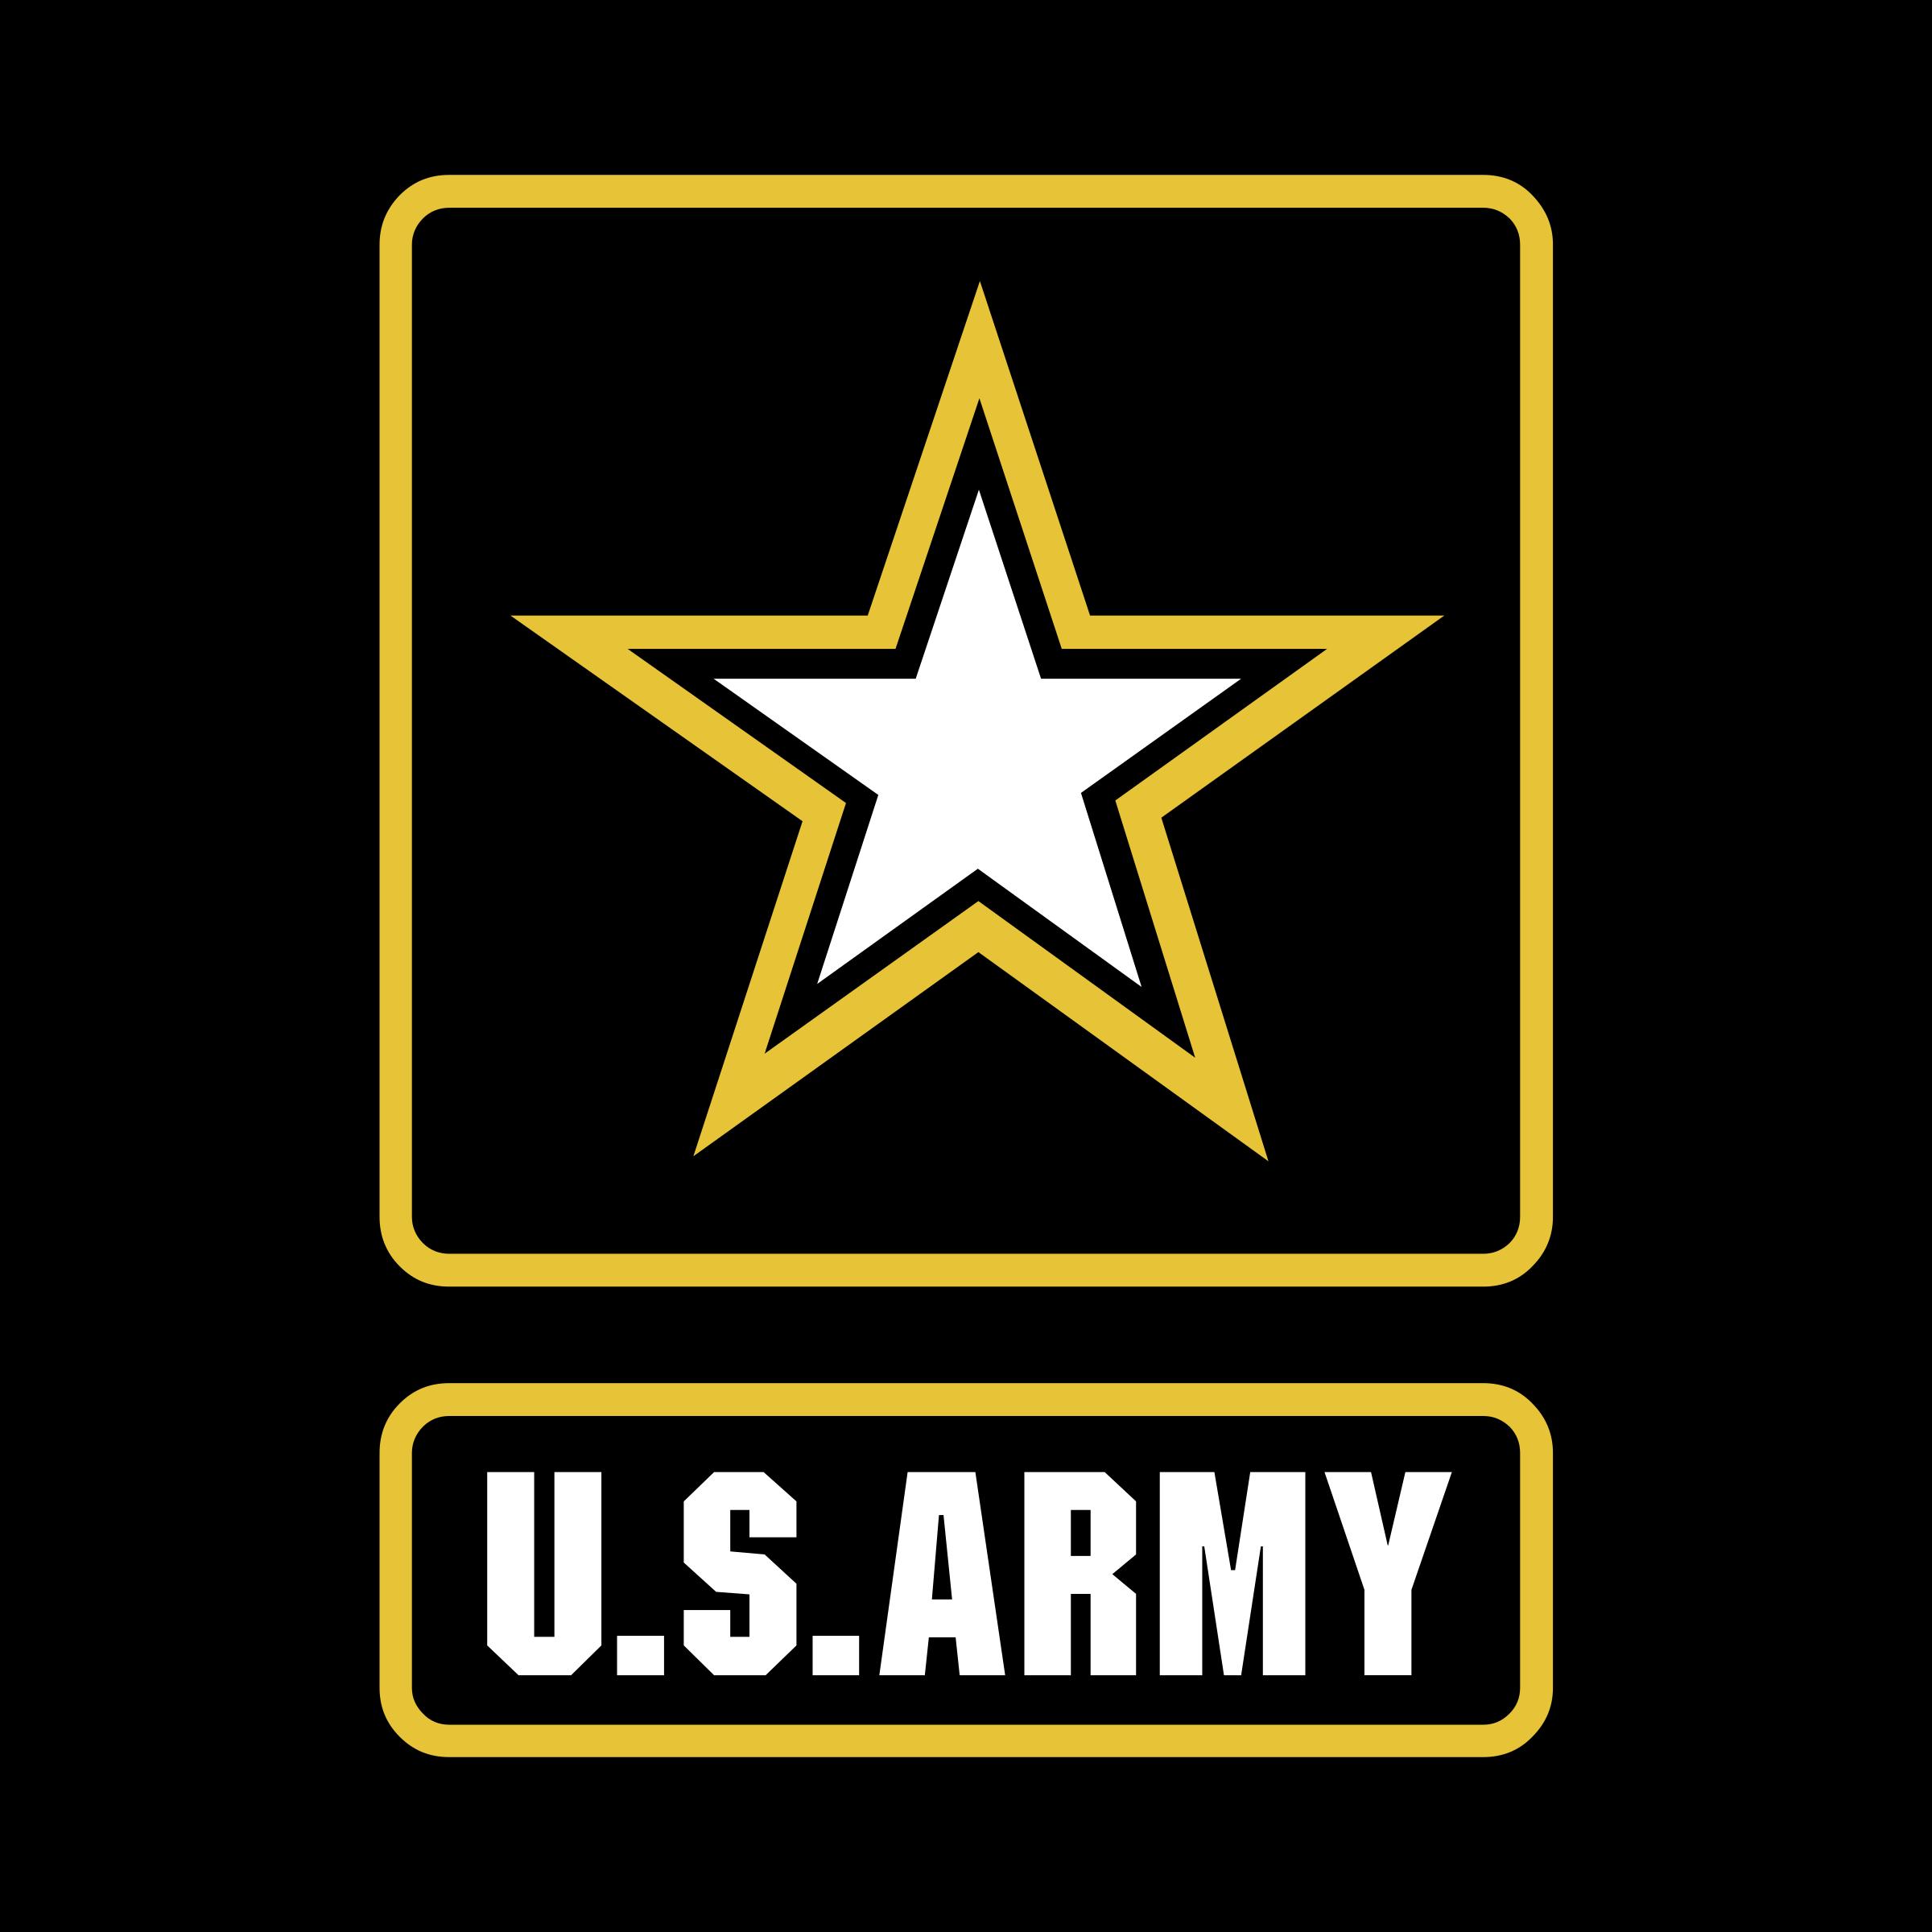 US Army Logo PNG Transparent & SVG Vector.